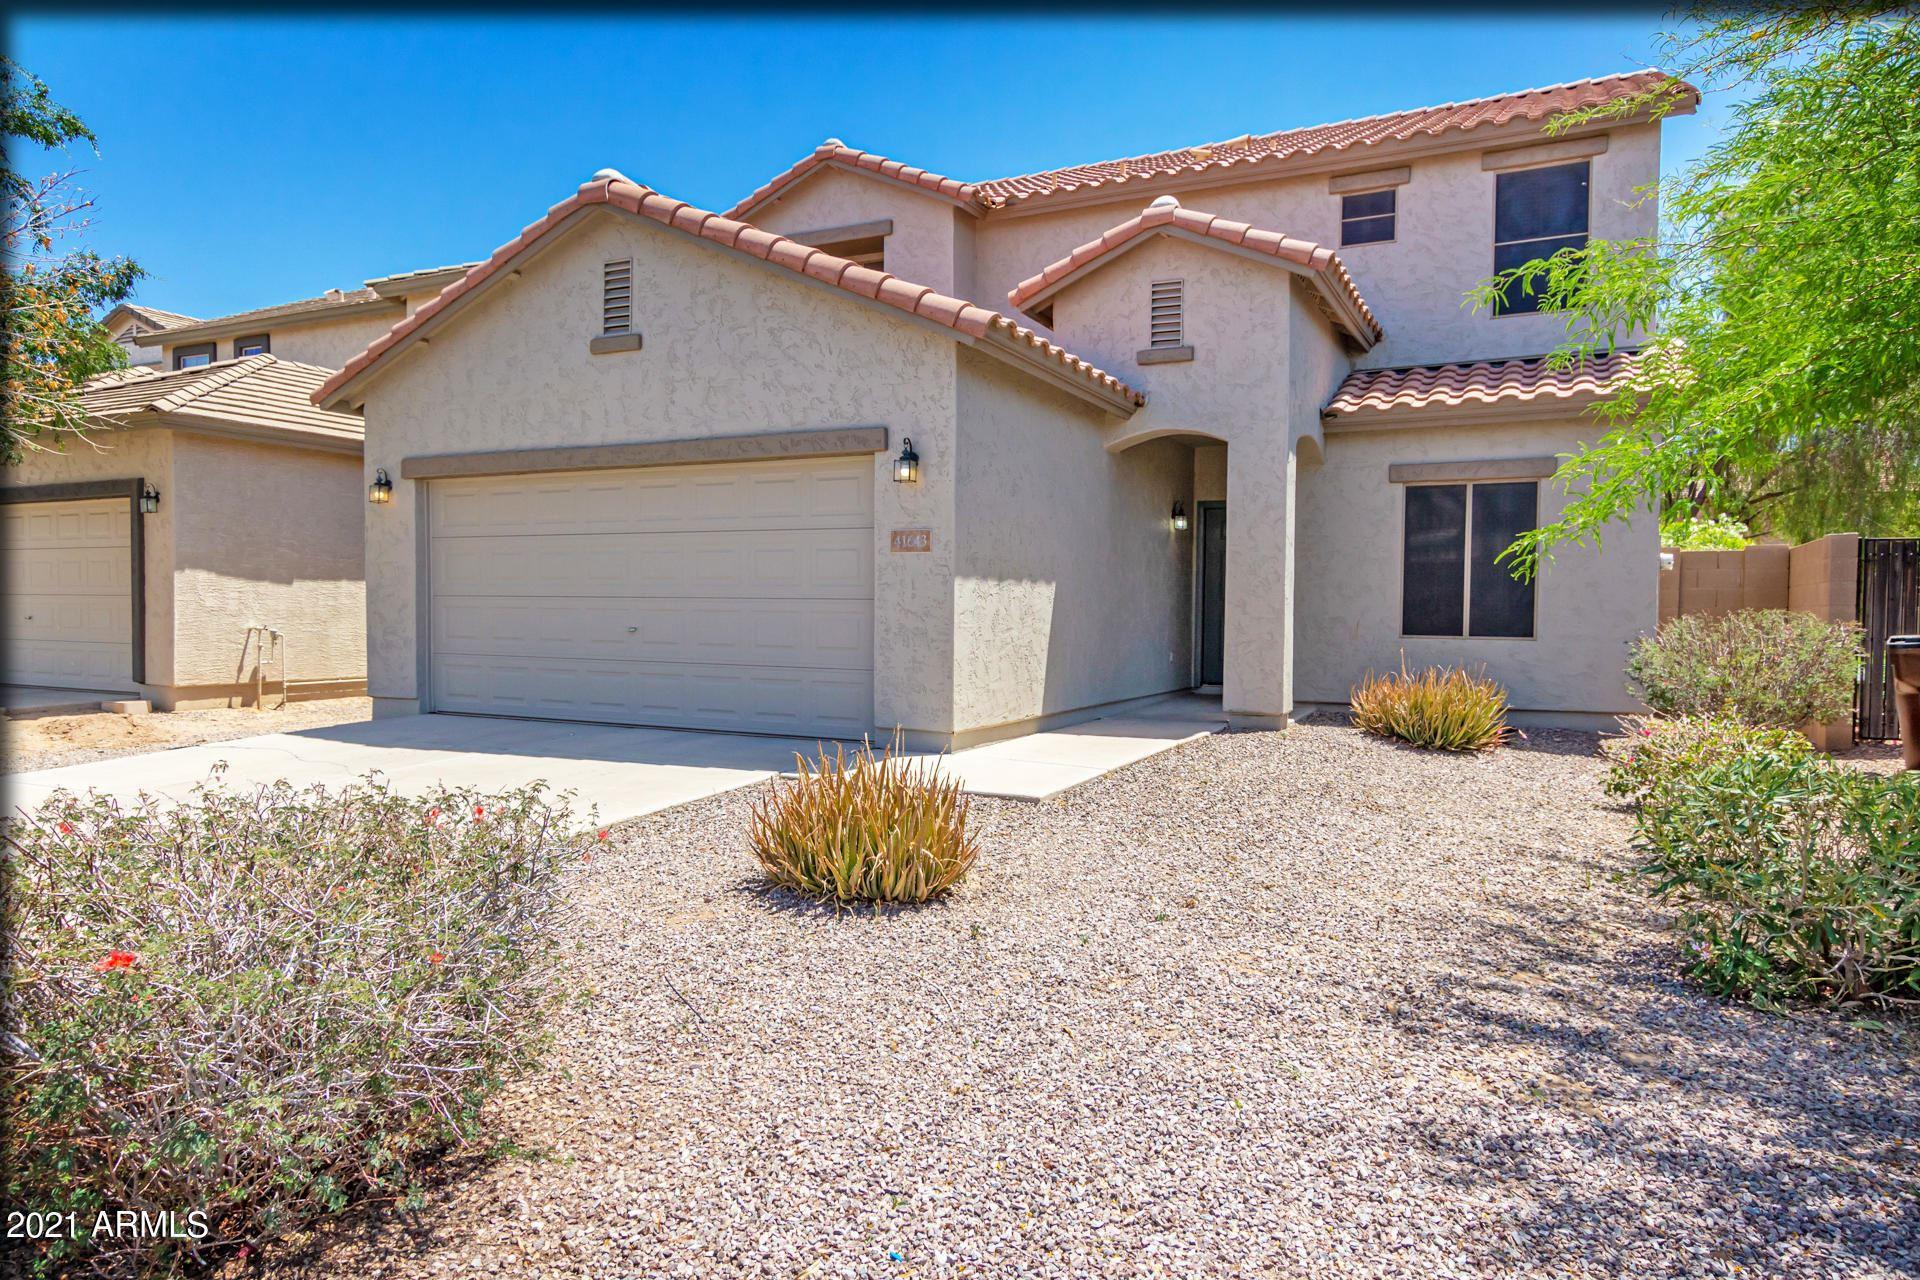 Photo of 41643 N OETTING Trail, San Tan Valley, AZ 85140 (MLS # 6230349)